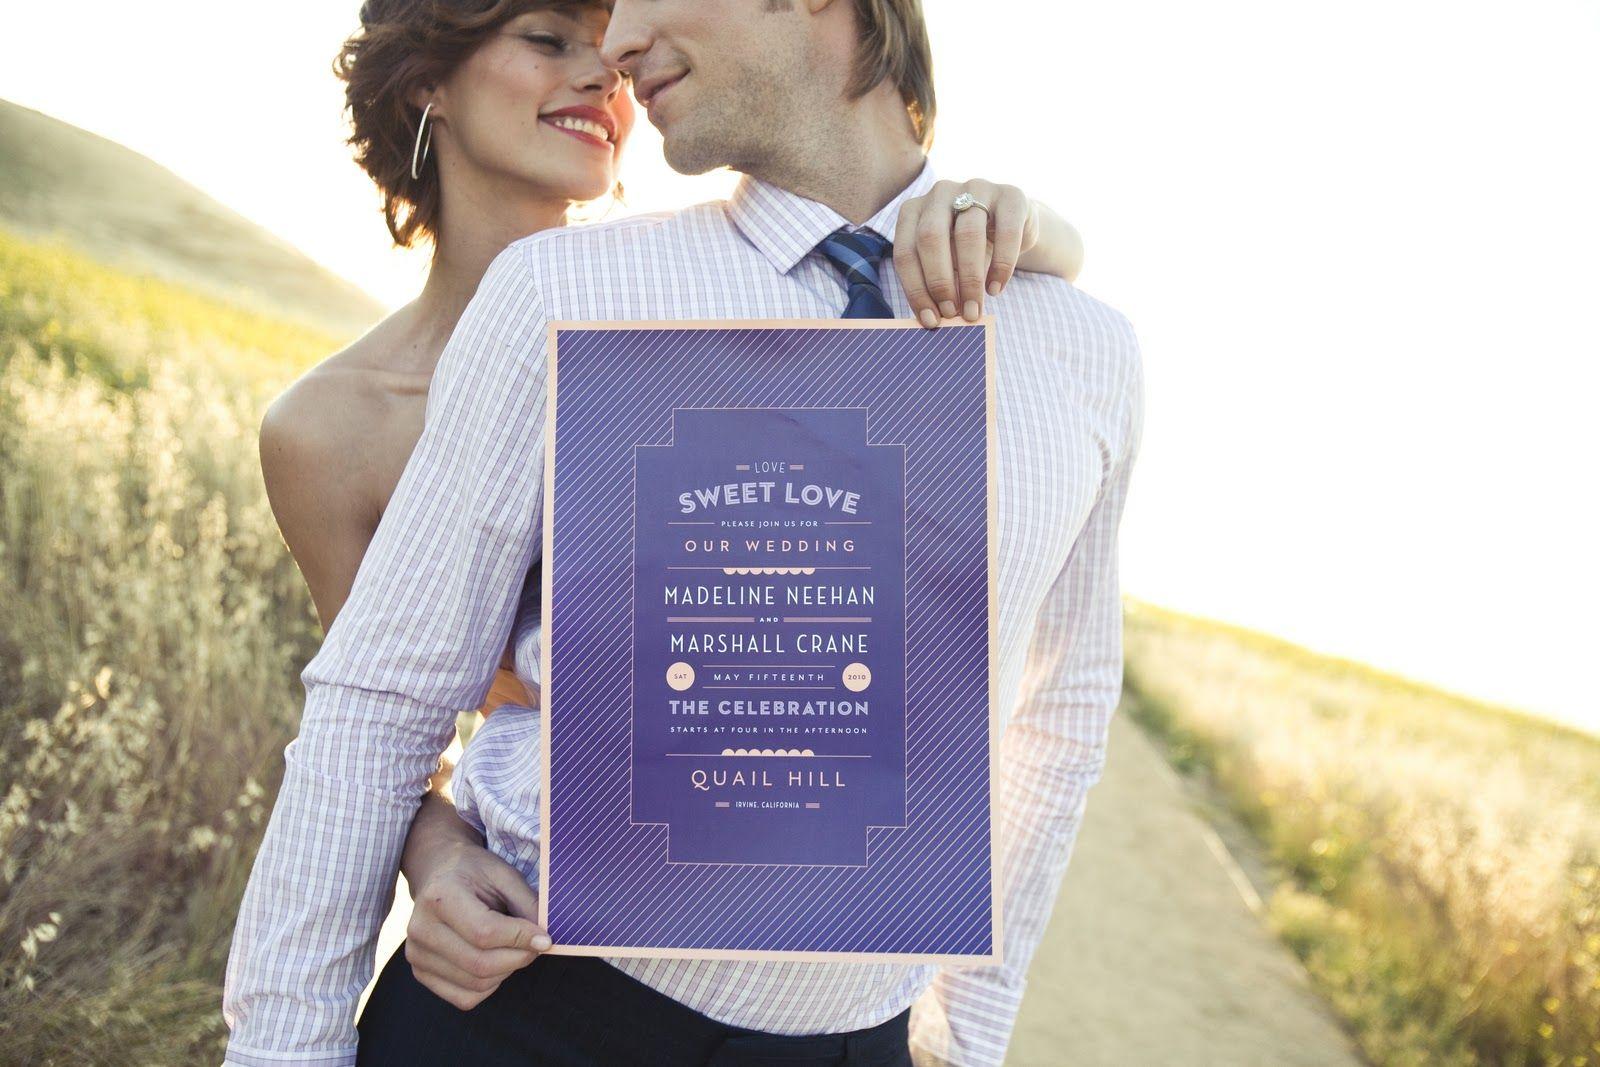 Korean wedding decoration ideas  Wedding Poster  GRAPHIC DESIGN  Pinterest  Wedding posters